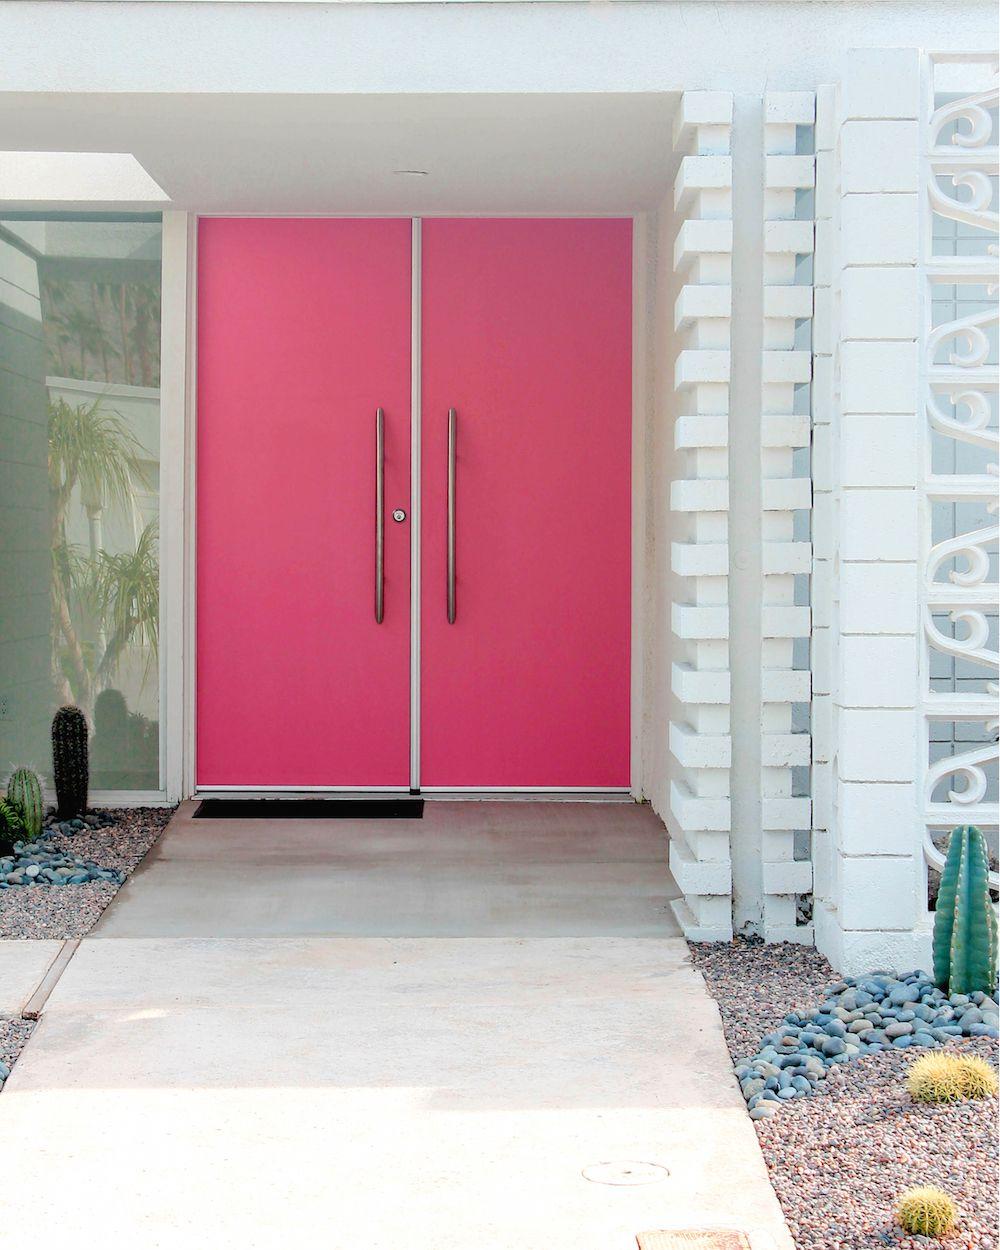 THE DOORS OF PALM SPRINGS – Design Darling